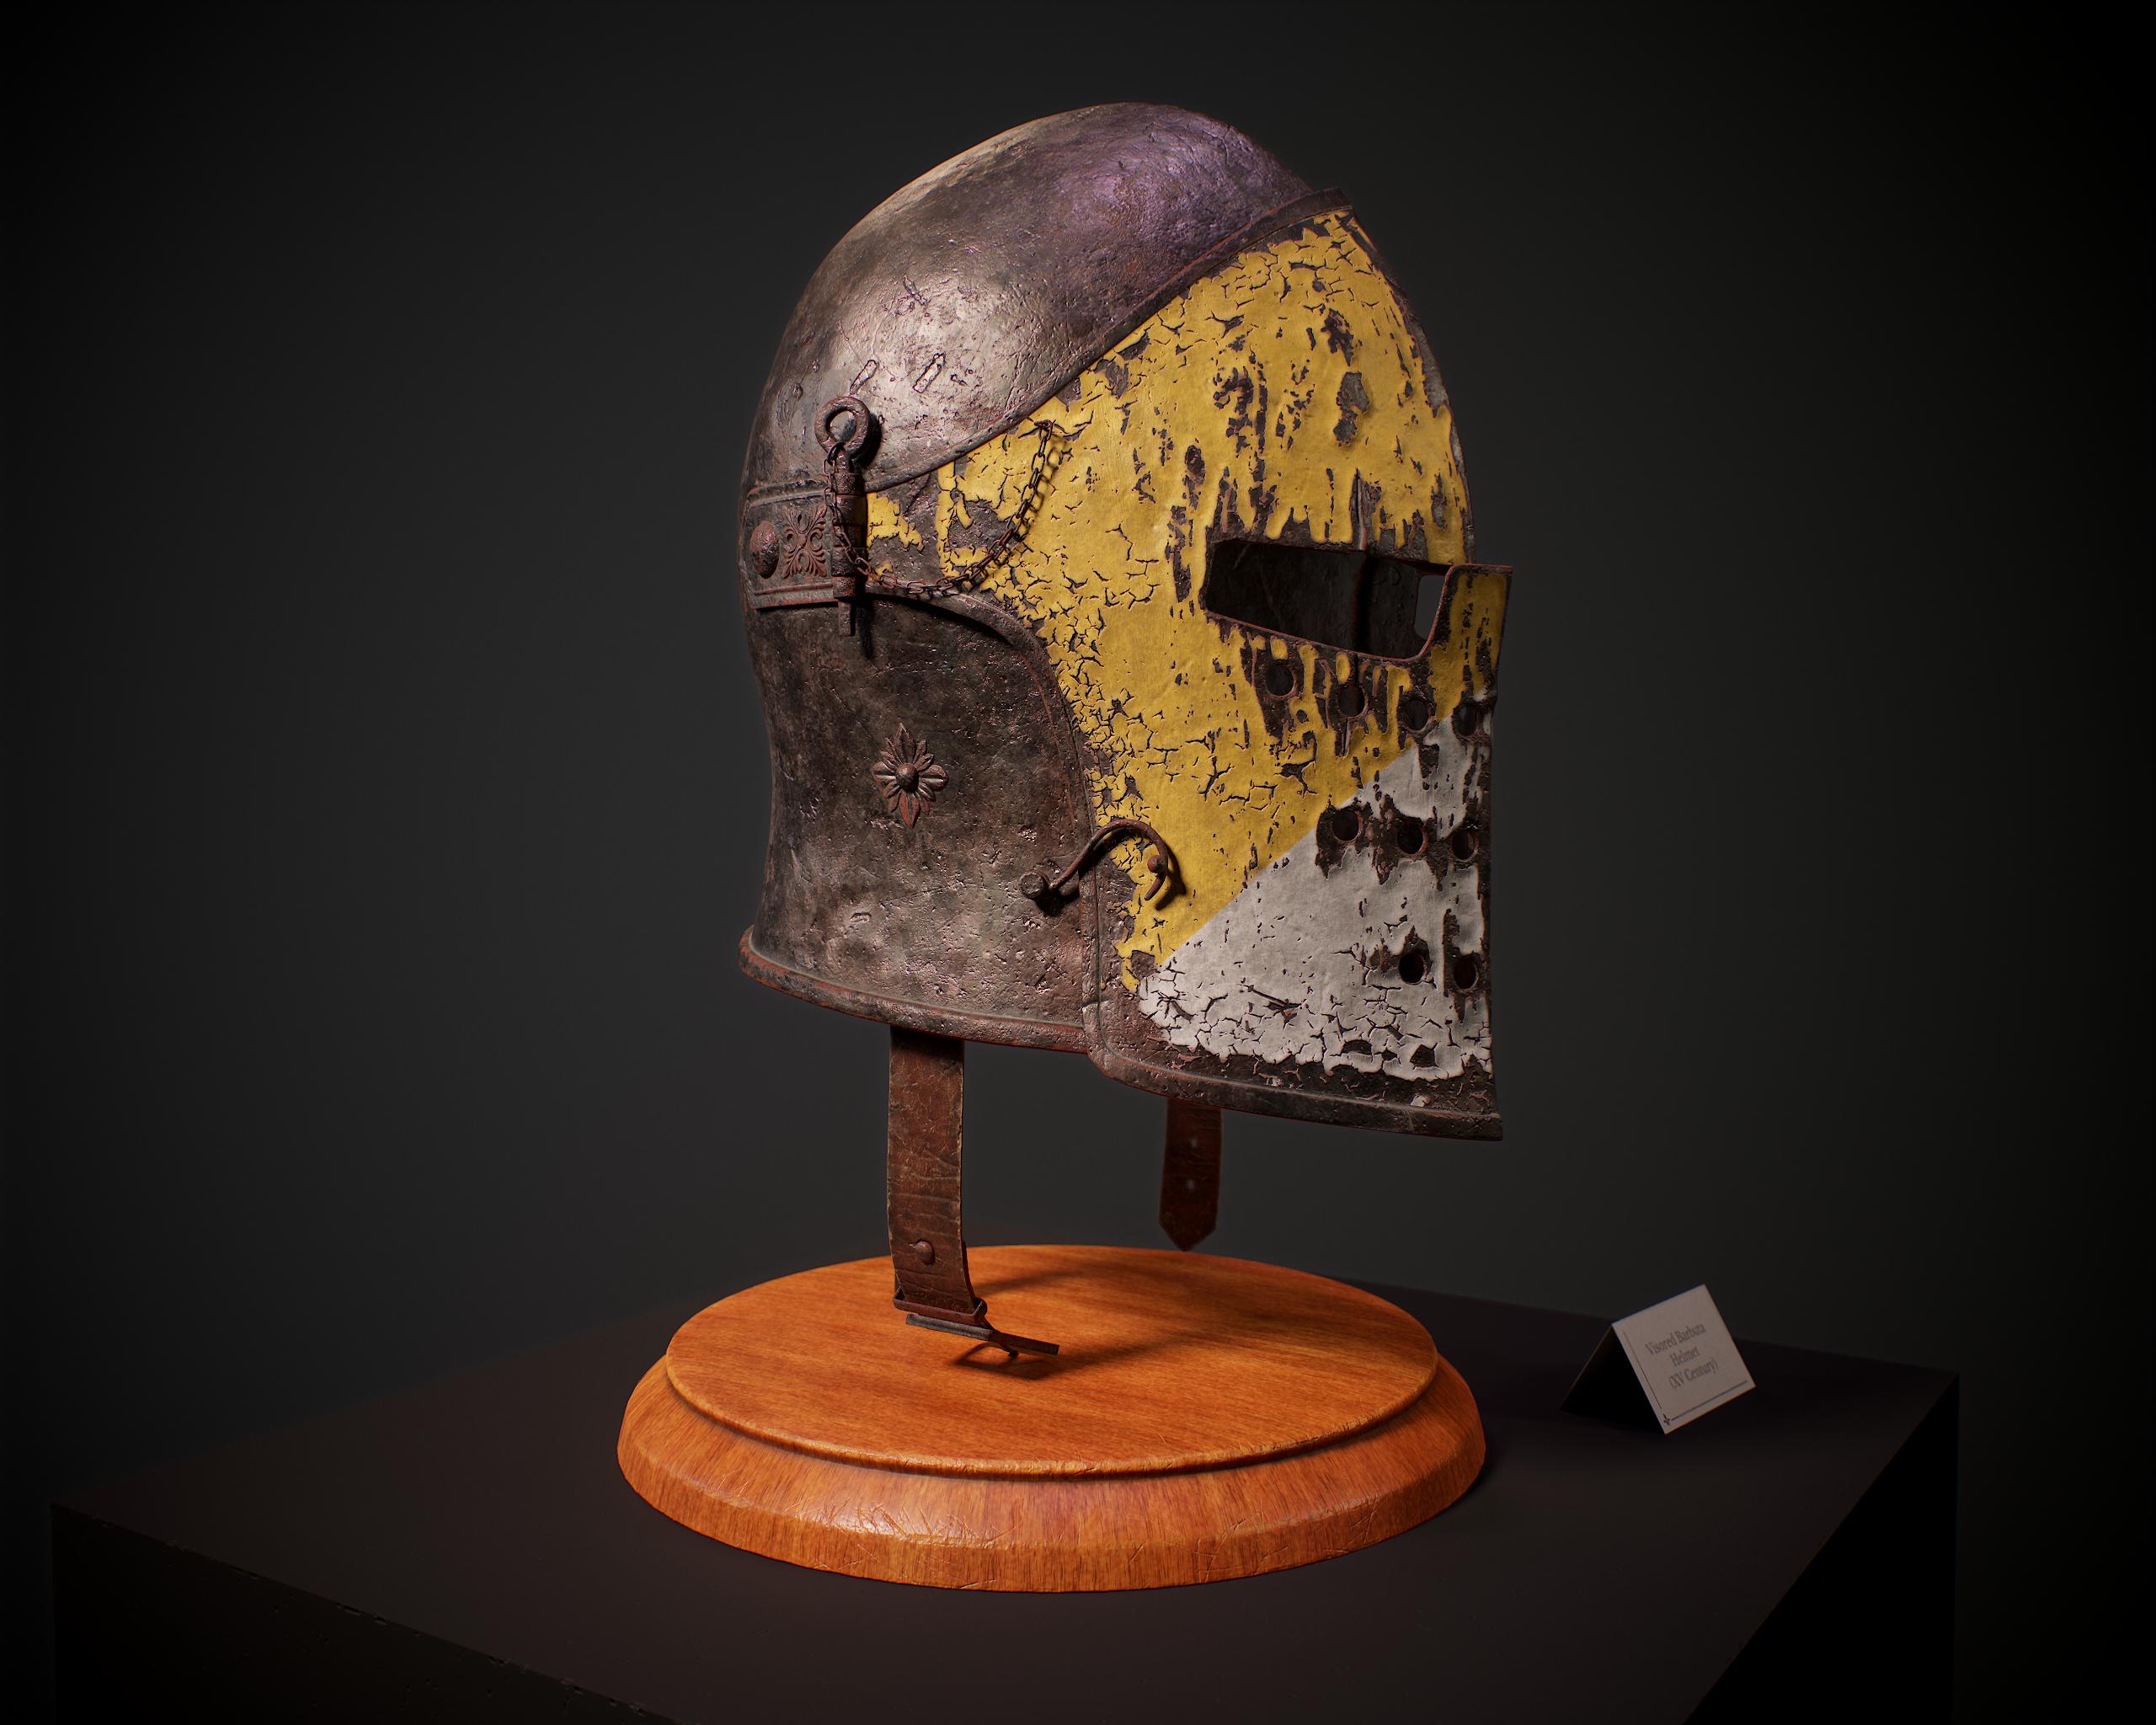 Helmet_11